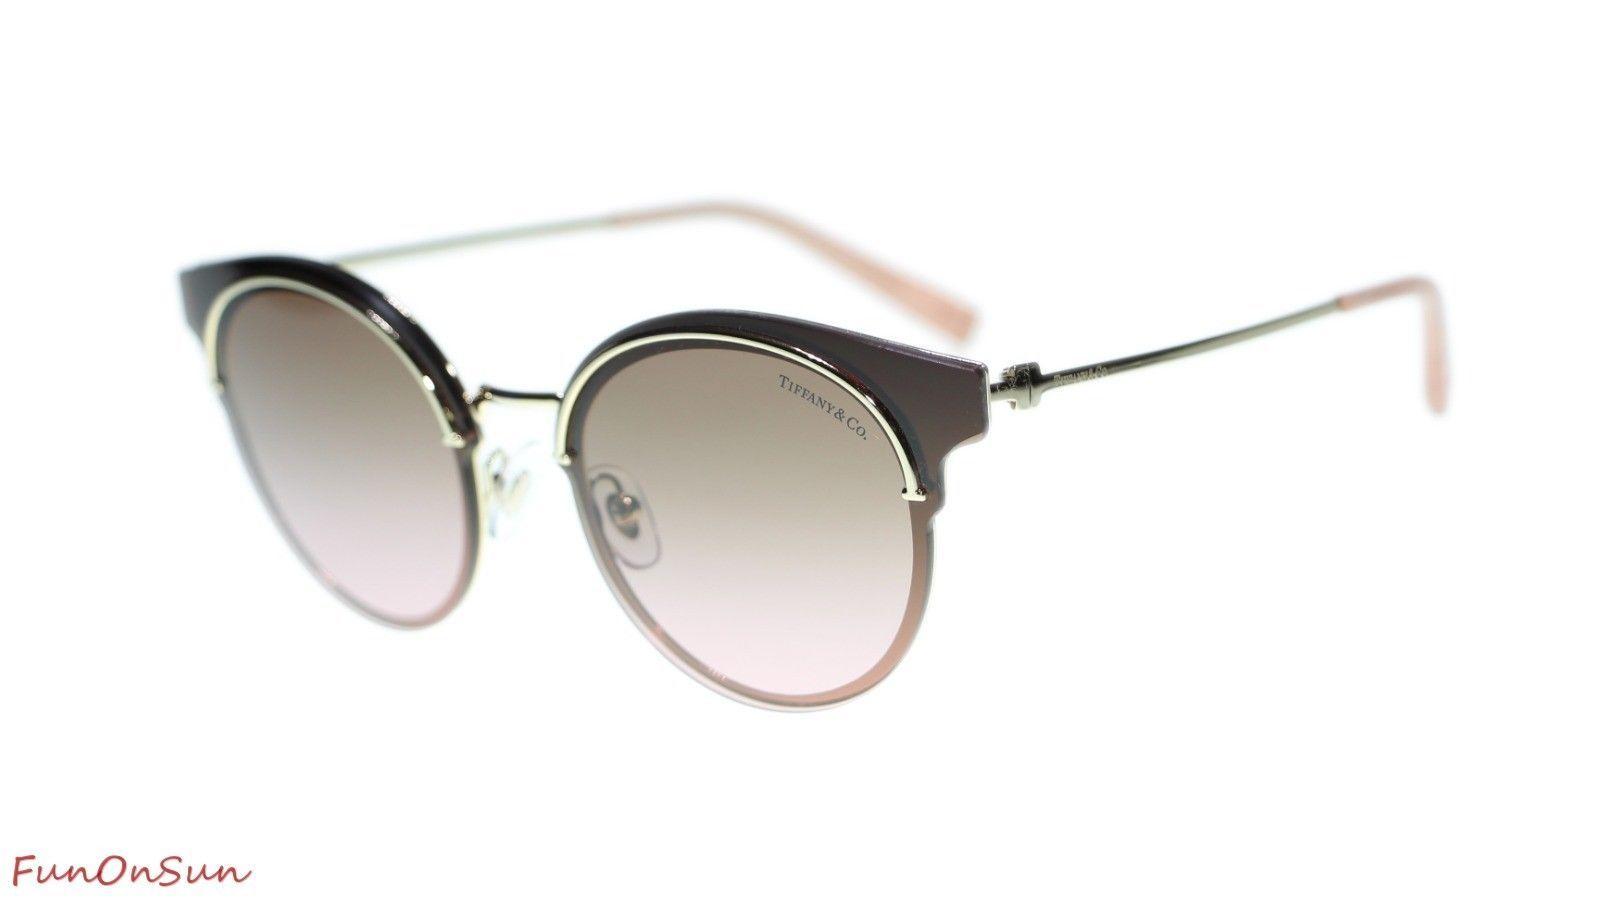 11678d7f05 10. 10. TIFFANY CO Women Sunglasses TF3061 6131F5 Gold Violet Gradient Brown  ...